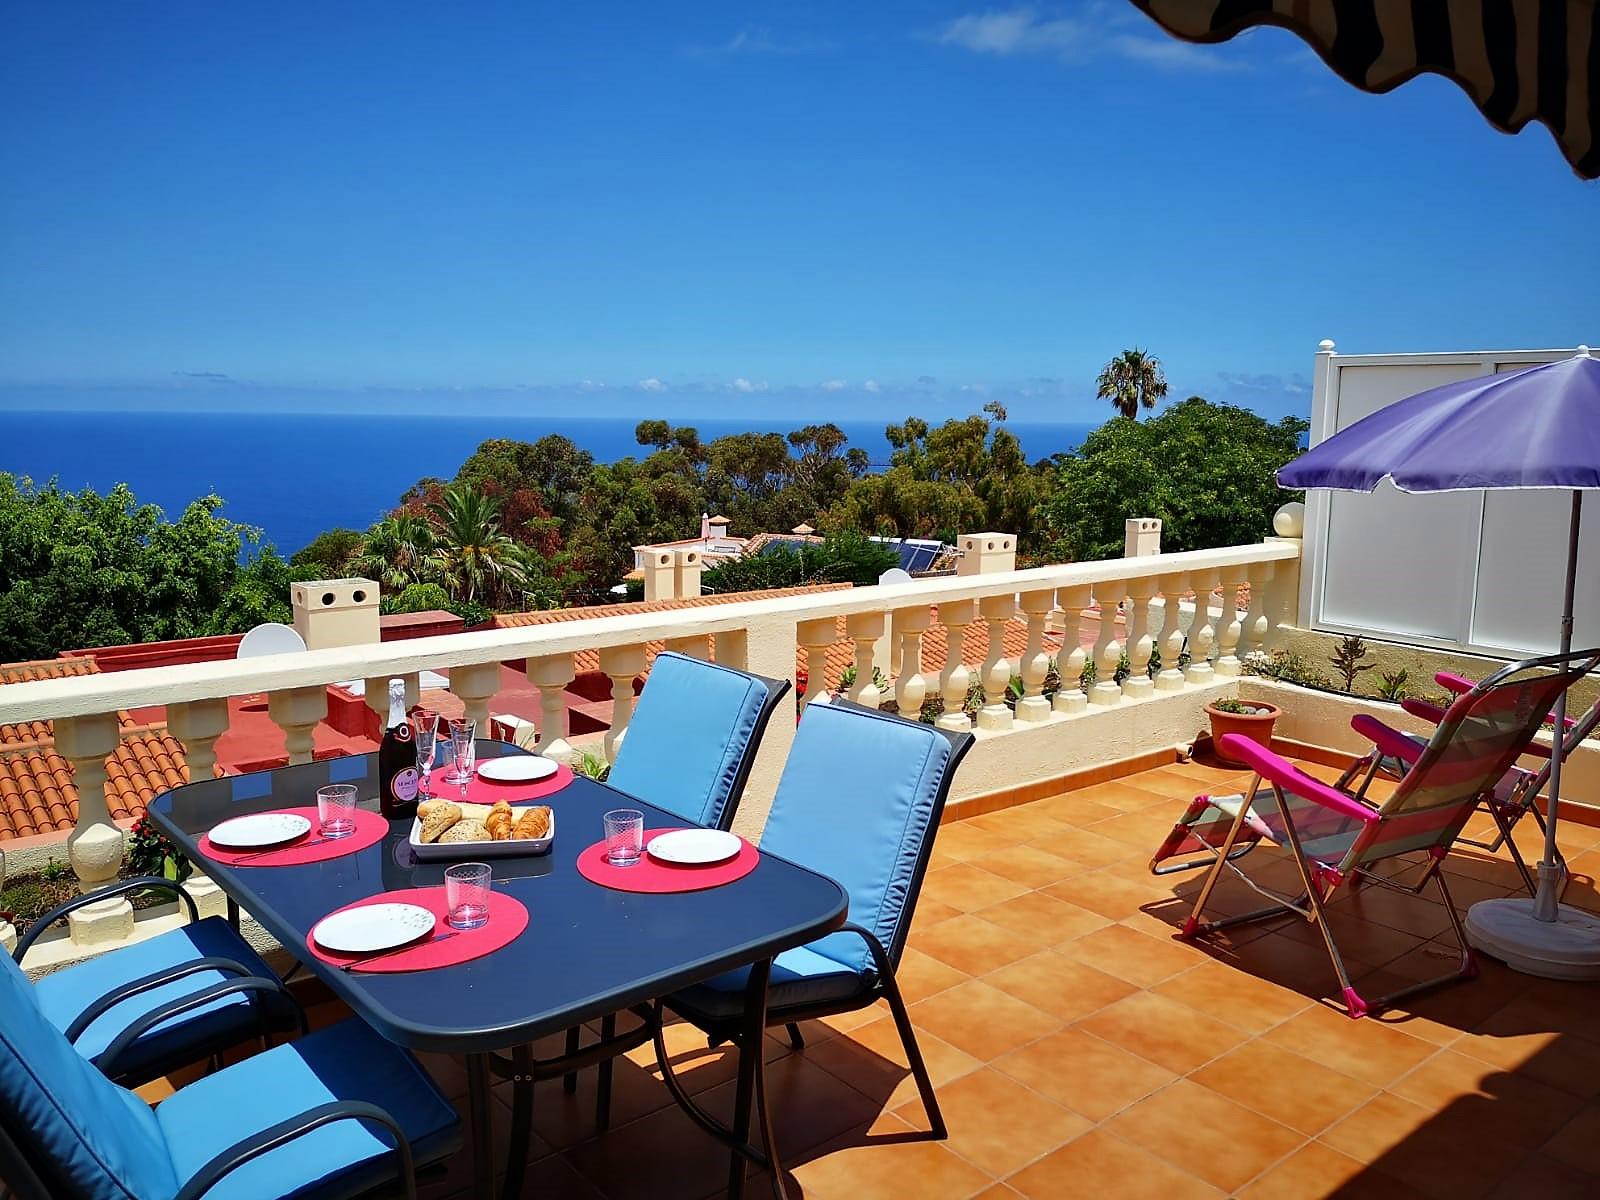 Ferienhaus Teneriffa Nord La Quinta Esstisch Terrasse